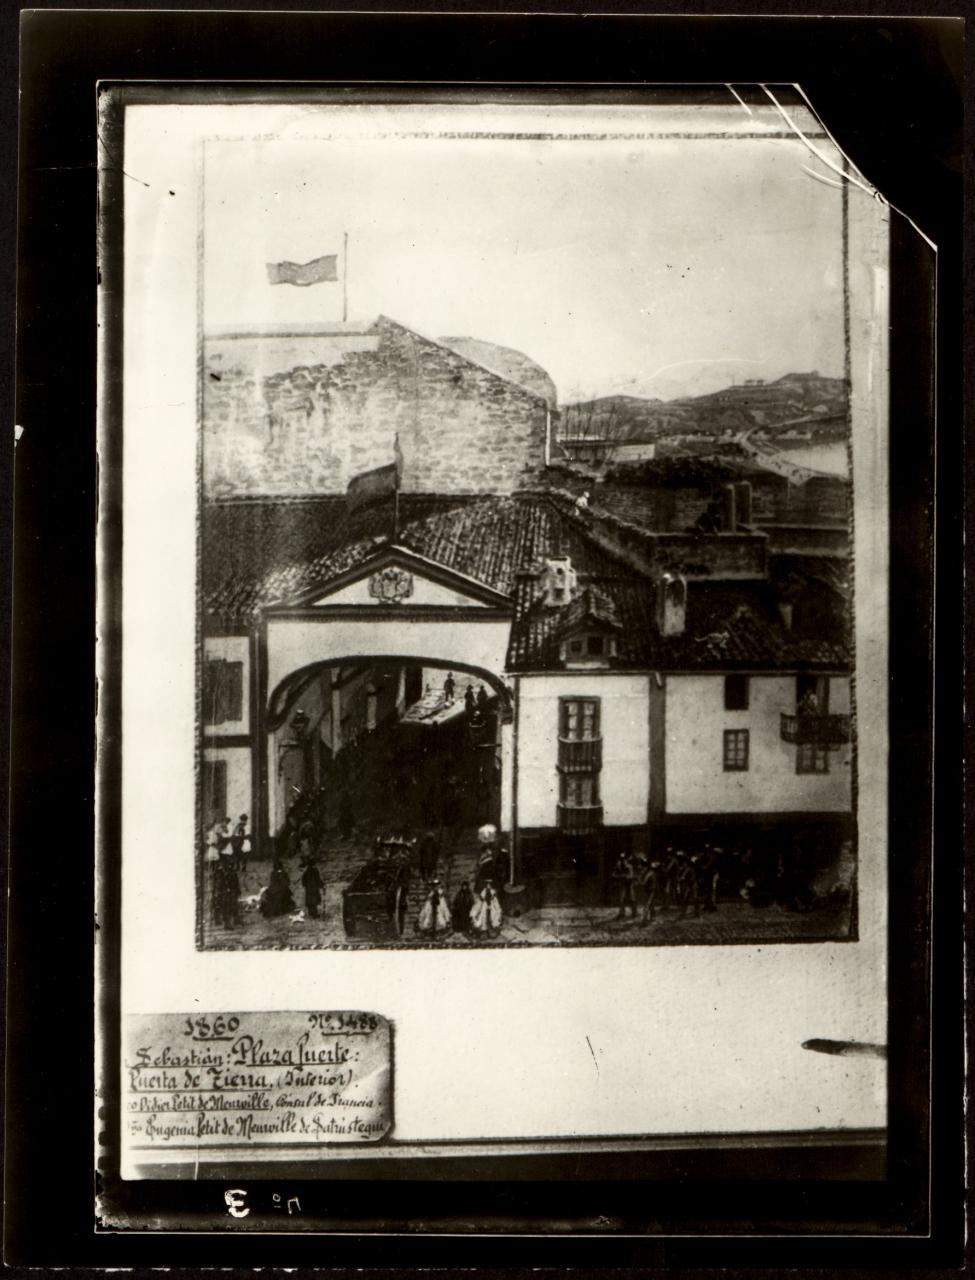 Puerta Tierra. San Sebastián.